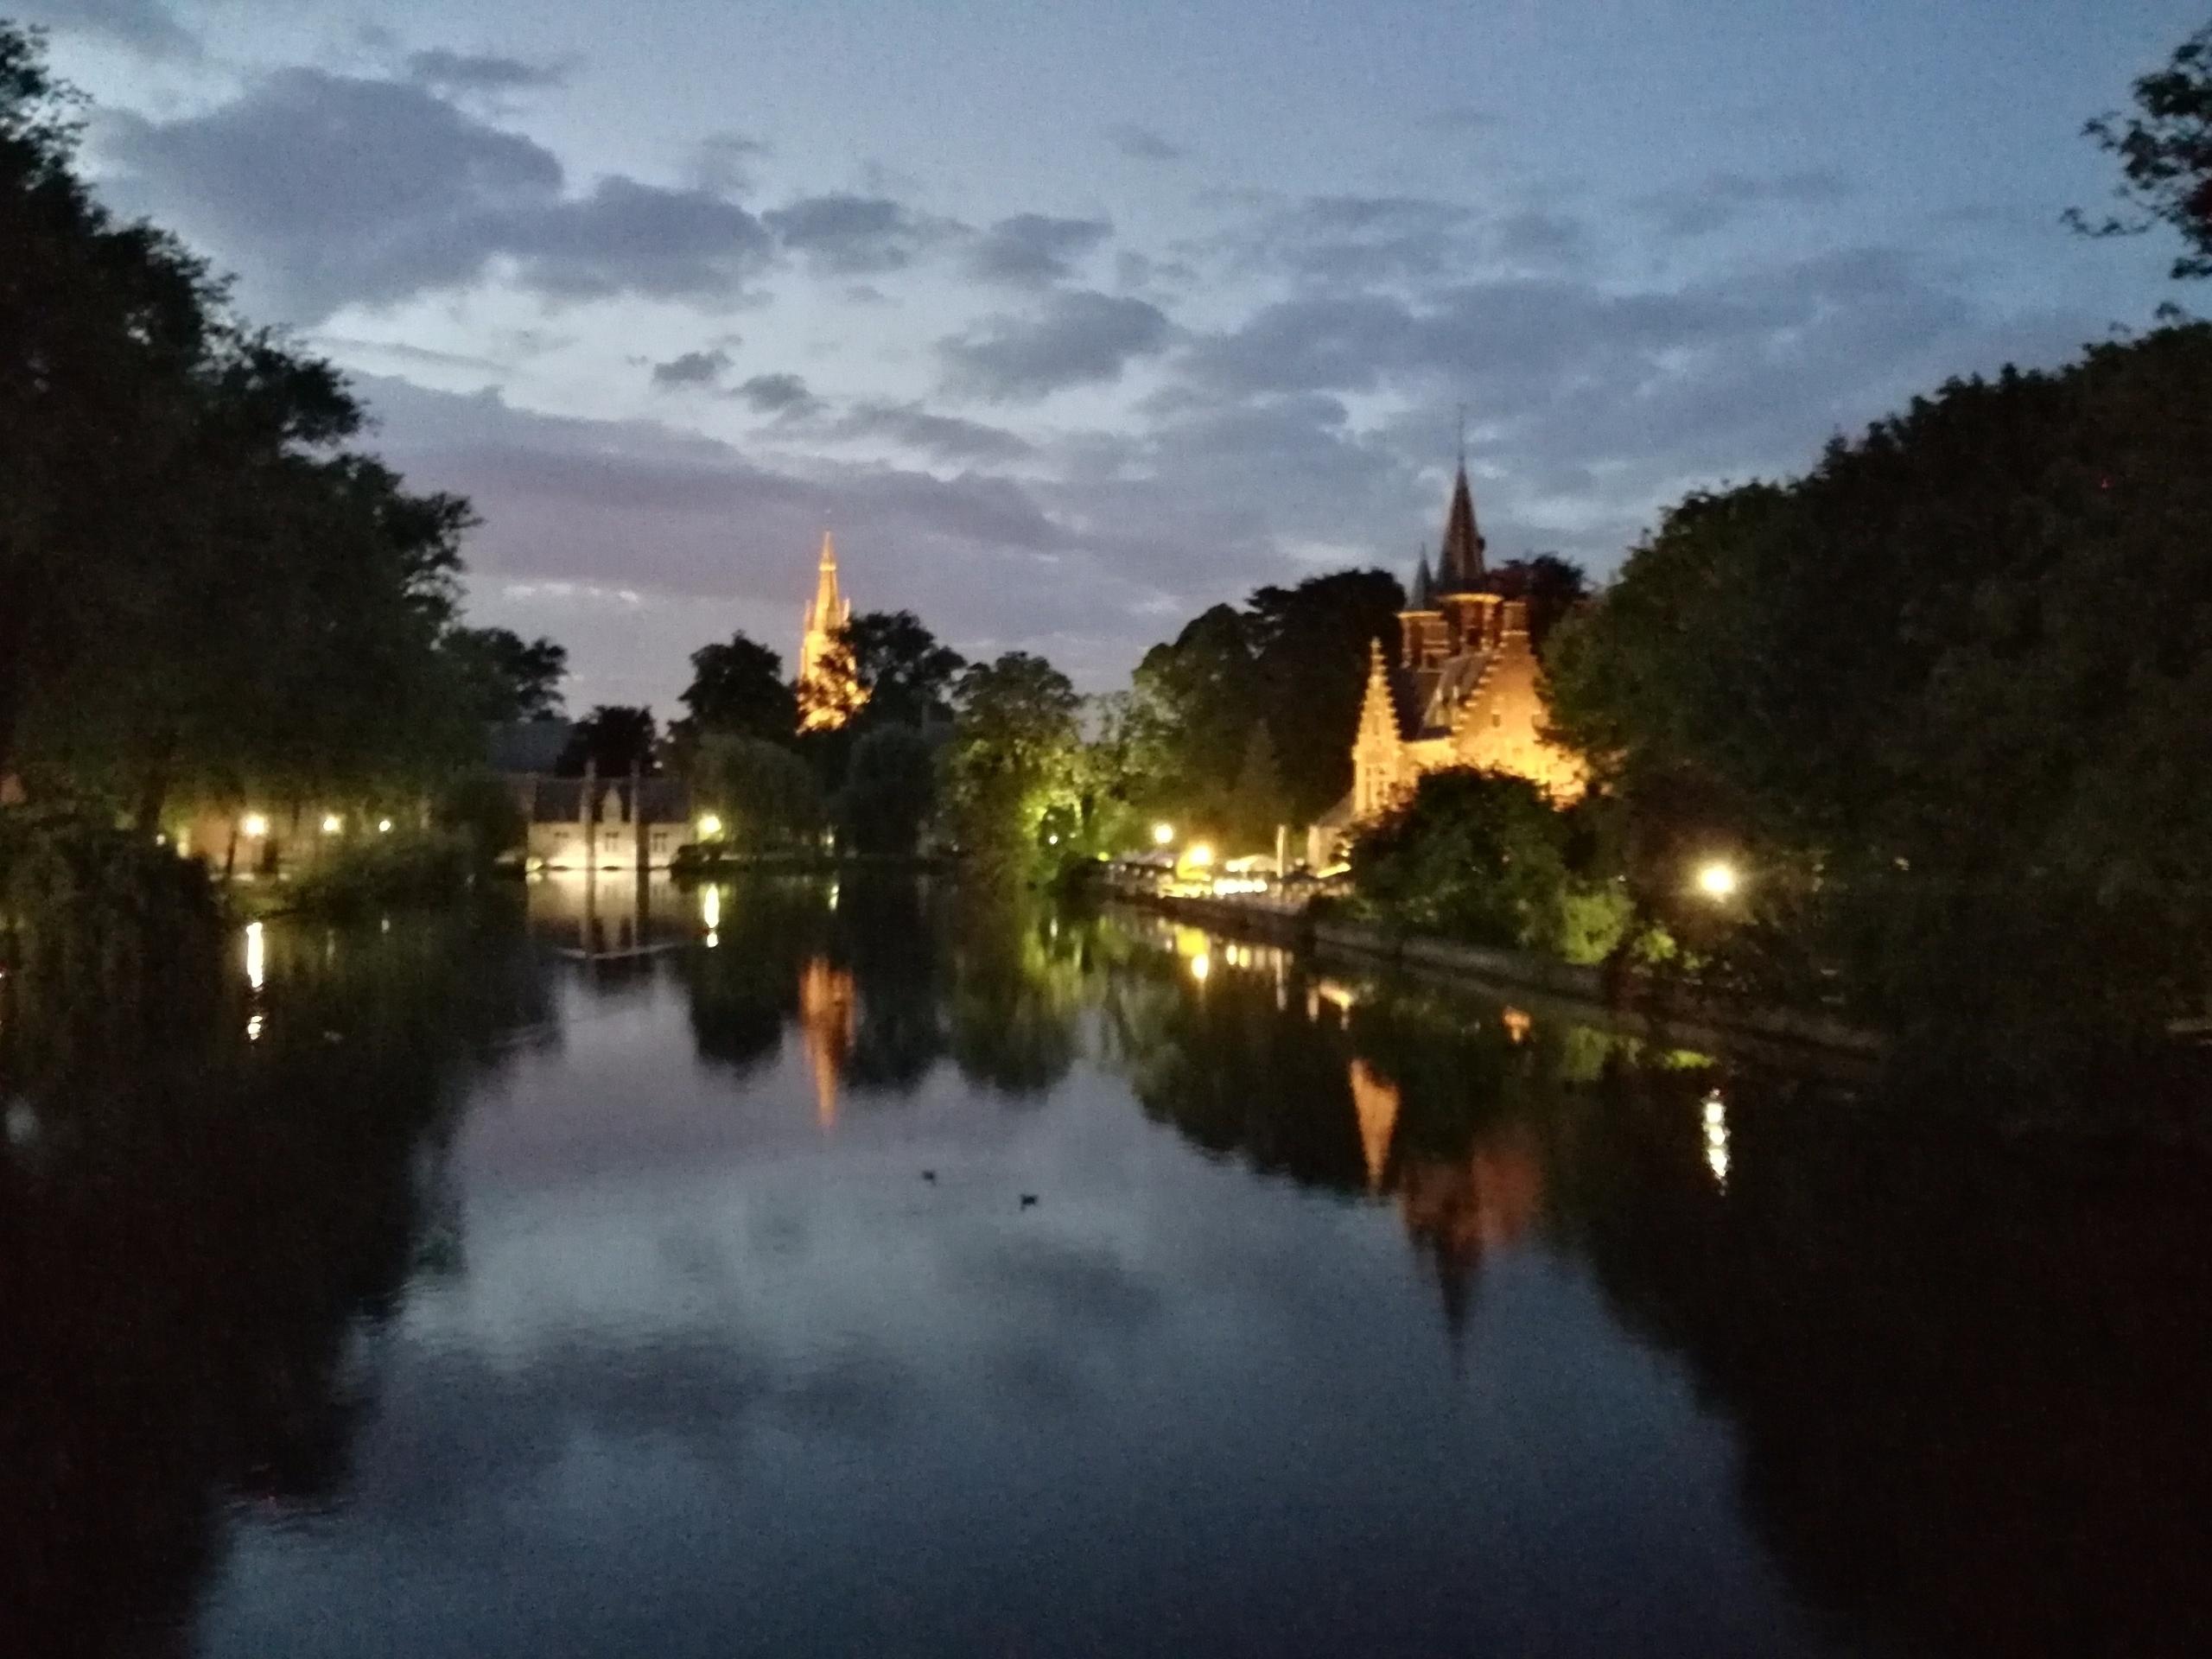 Brugge - Natural Mirror Huawei  - bartvancoillie | ello